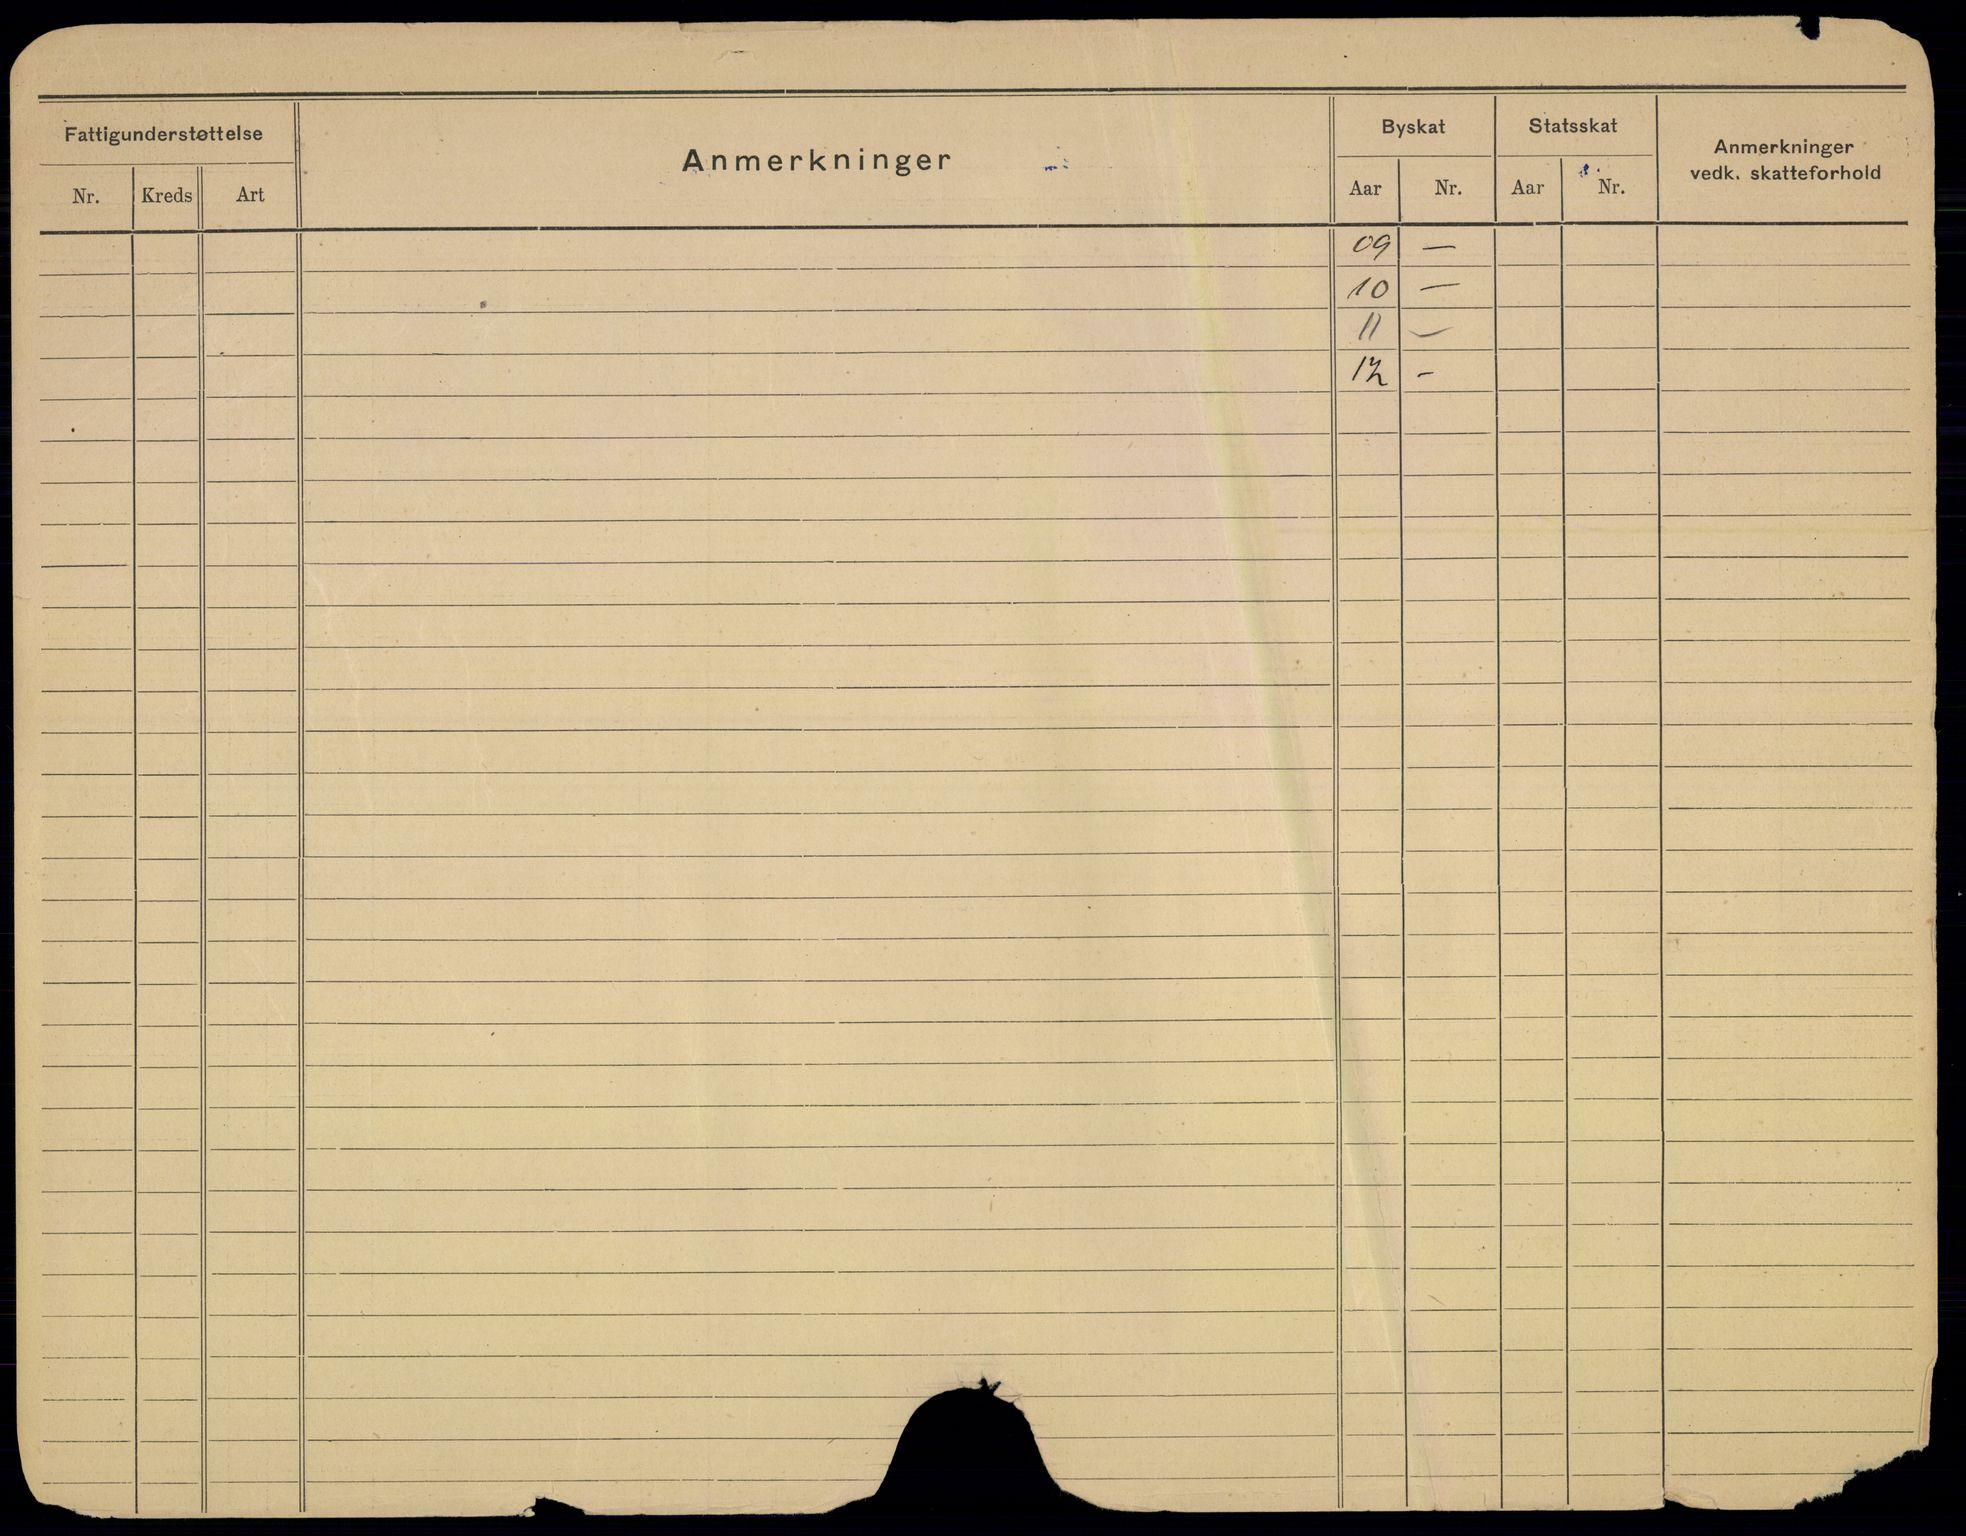 SAO, Oslo folkeregister, Registerkort, G/Gb/L0015: Menn, 1913